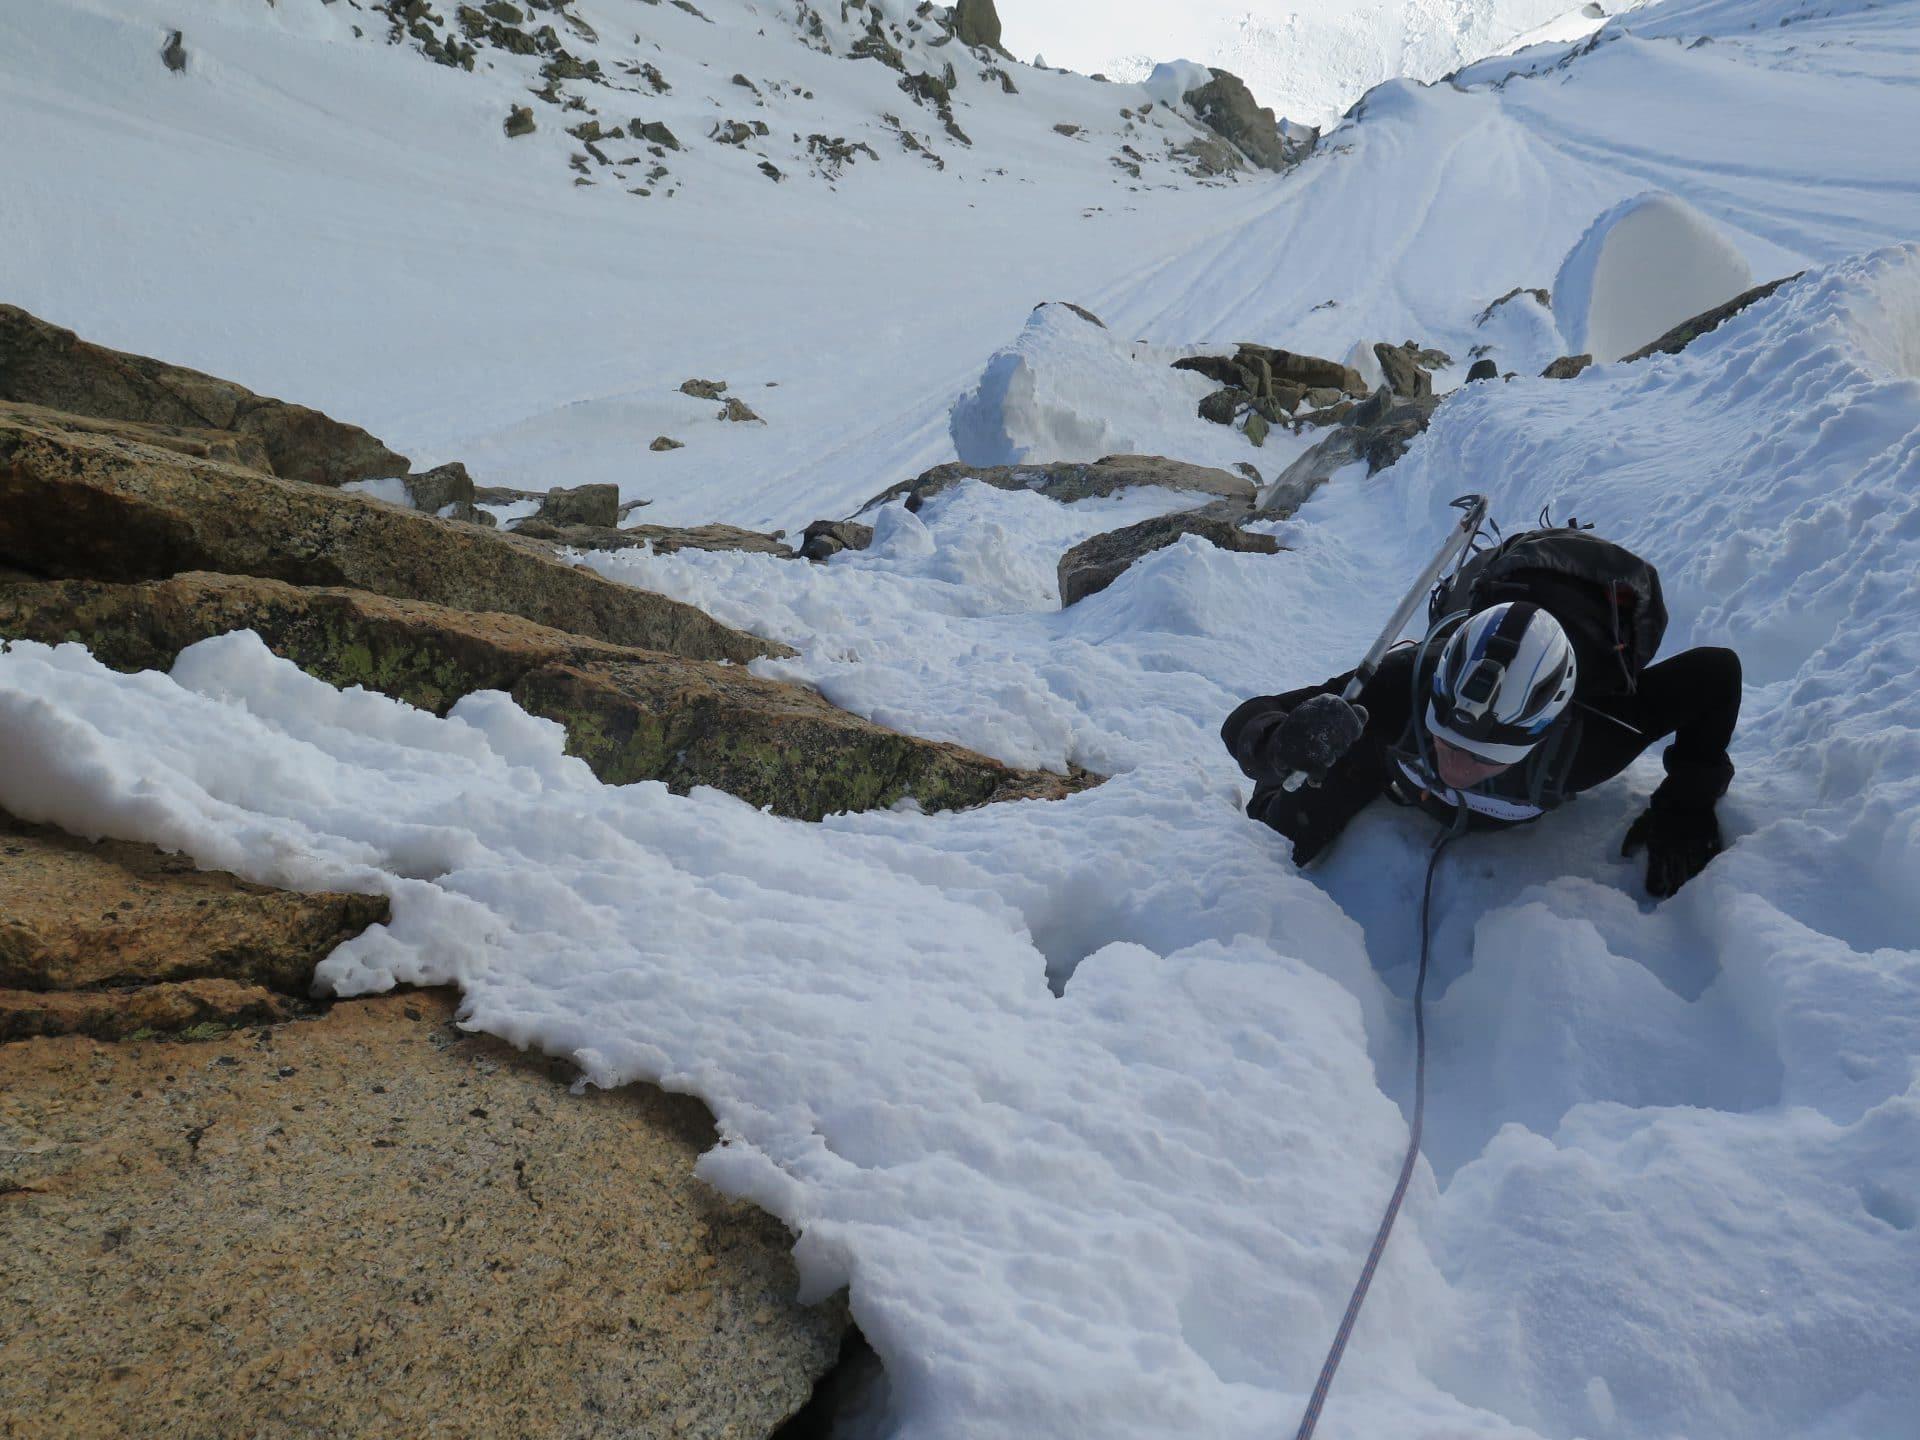 Helyum_Xavier-Carrard_guide-de-montagne_Alpinisme_arete-Kufner_Mont-Maudit_France_5